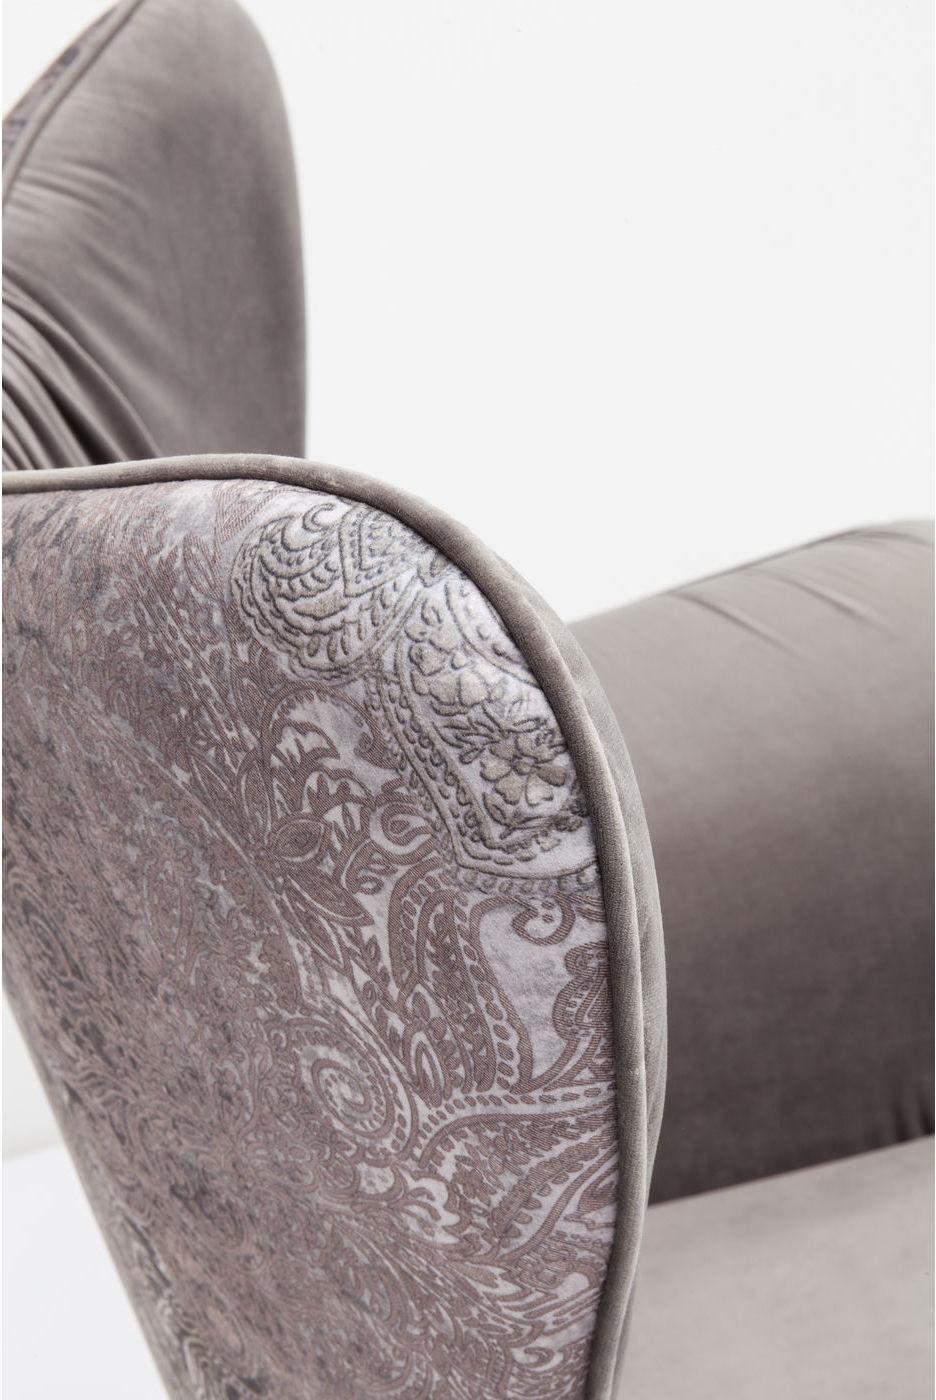 Kare Design - Fauteuil Wall Street - Grijs Fluweel